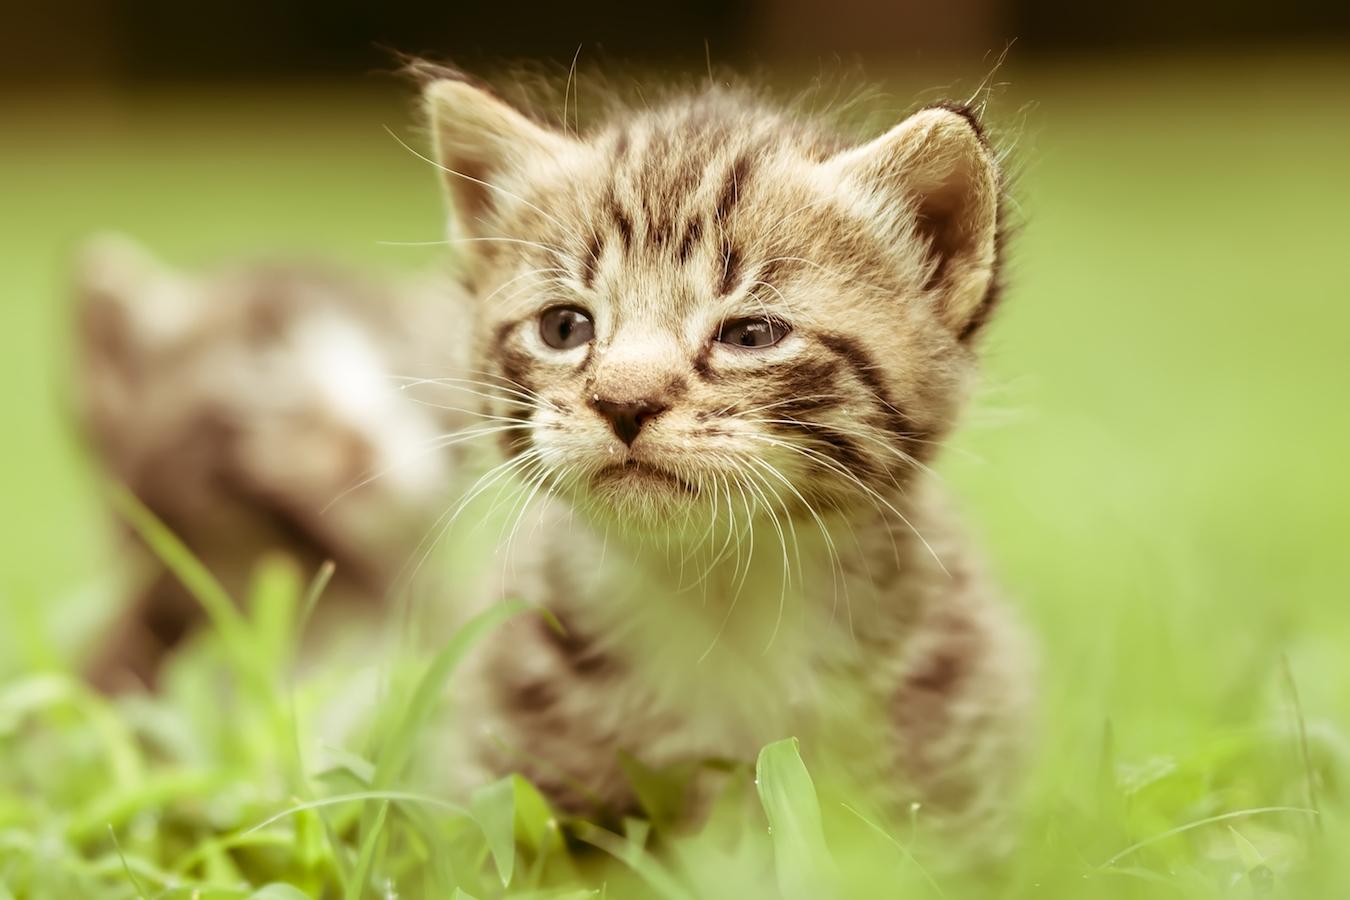 Cute Cat Wallpaper Backgrounds Er Det En Han Eller Hun Kat Bonnie Dyrecenter